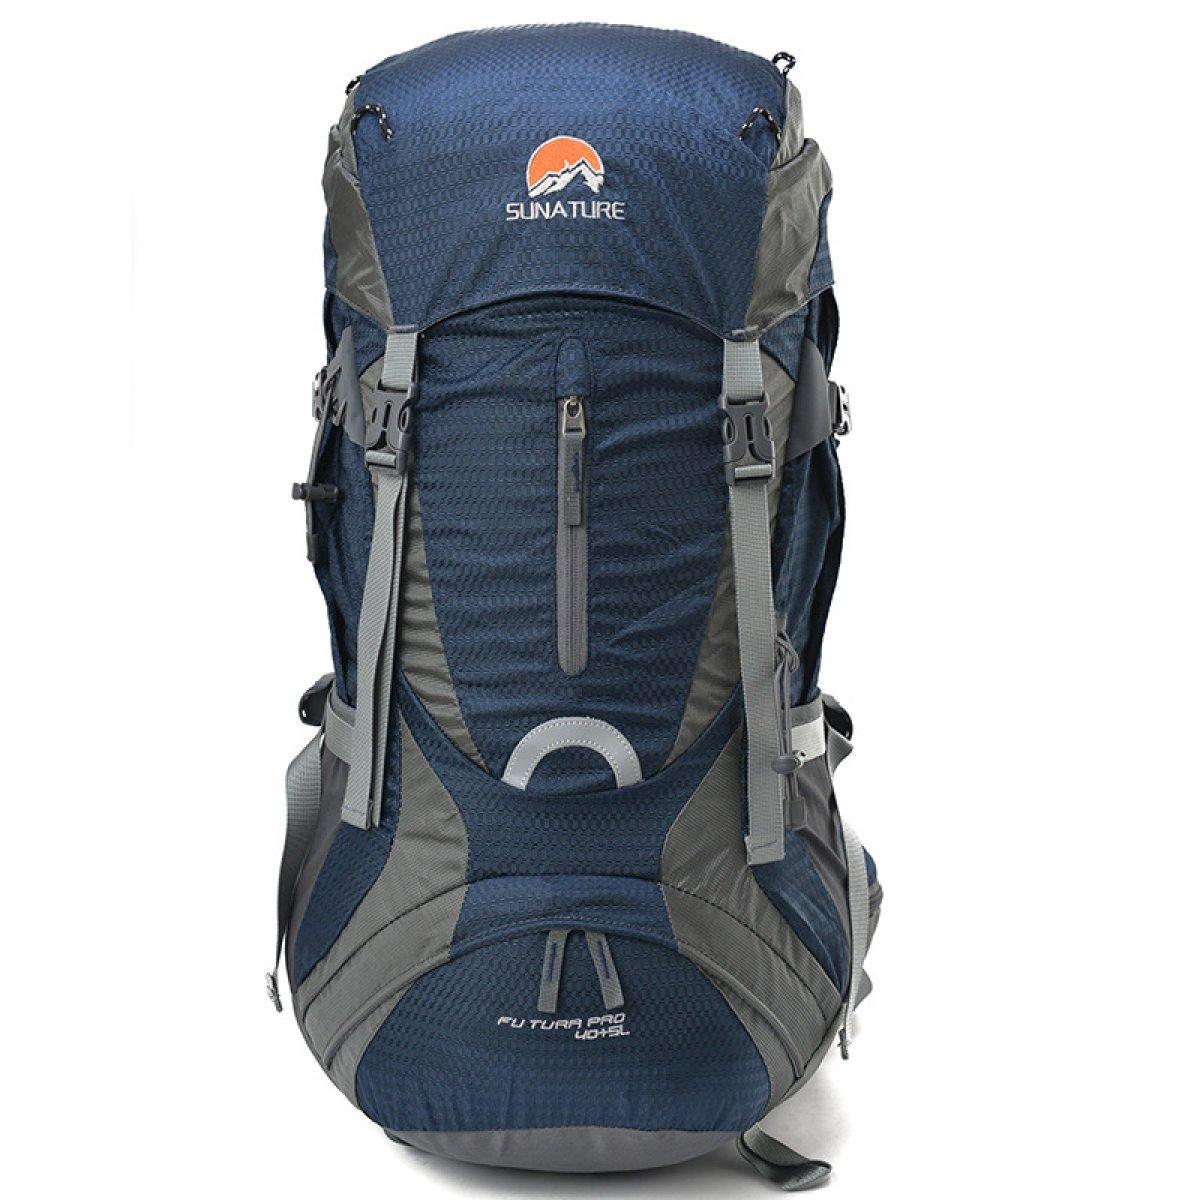 Unisex Multifunktionale Reisen Rucksack Outdoor Wandern Camping Daypack Fest Farbe